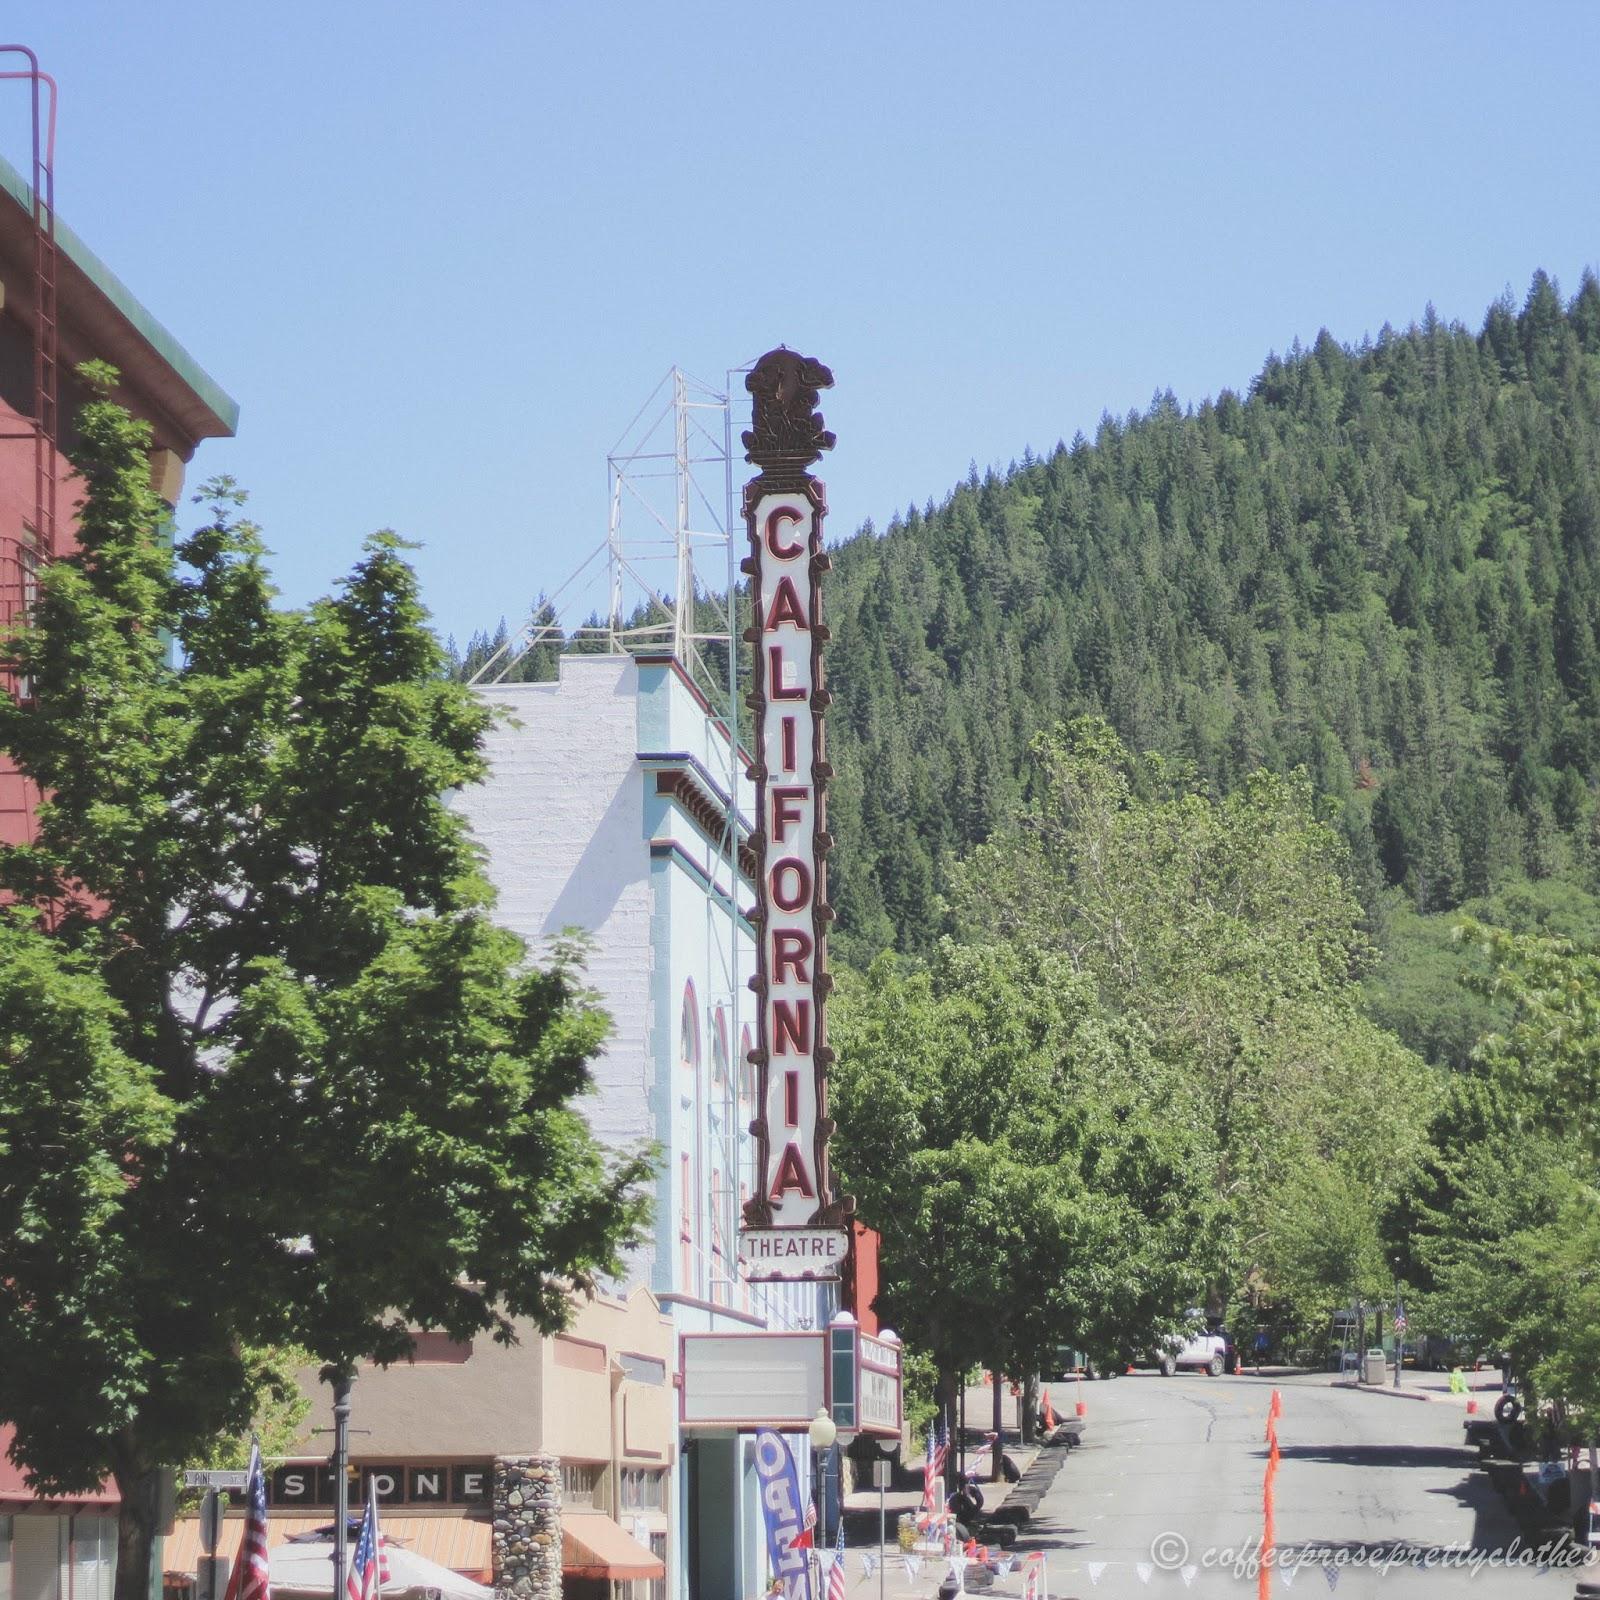 California Theater sign in Dunsmuir, CA